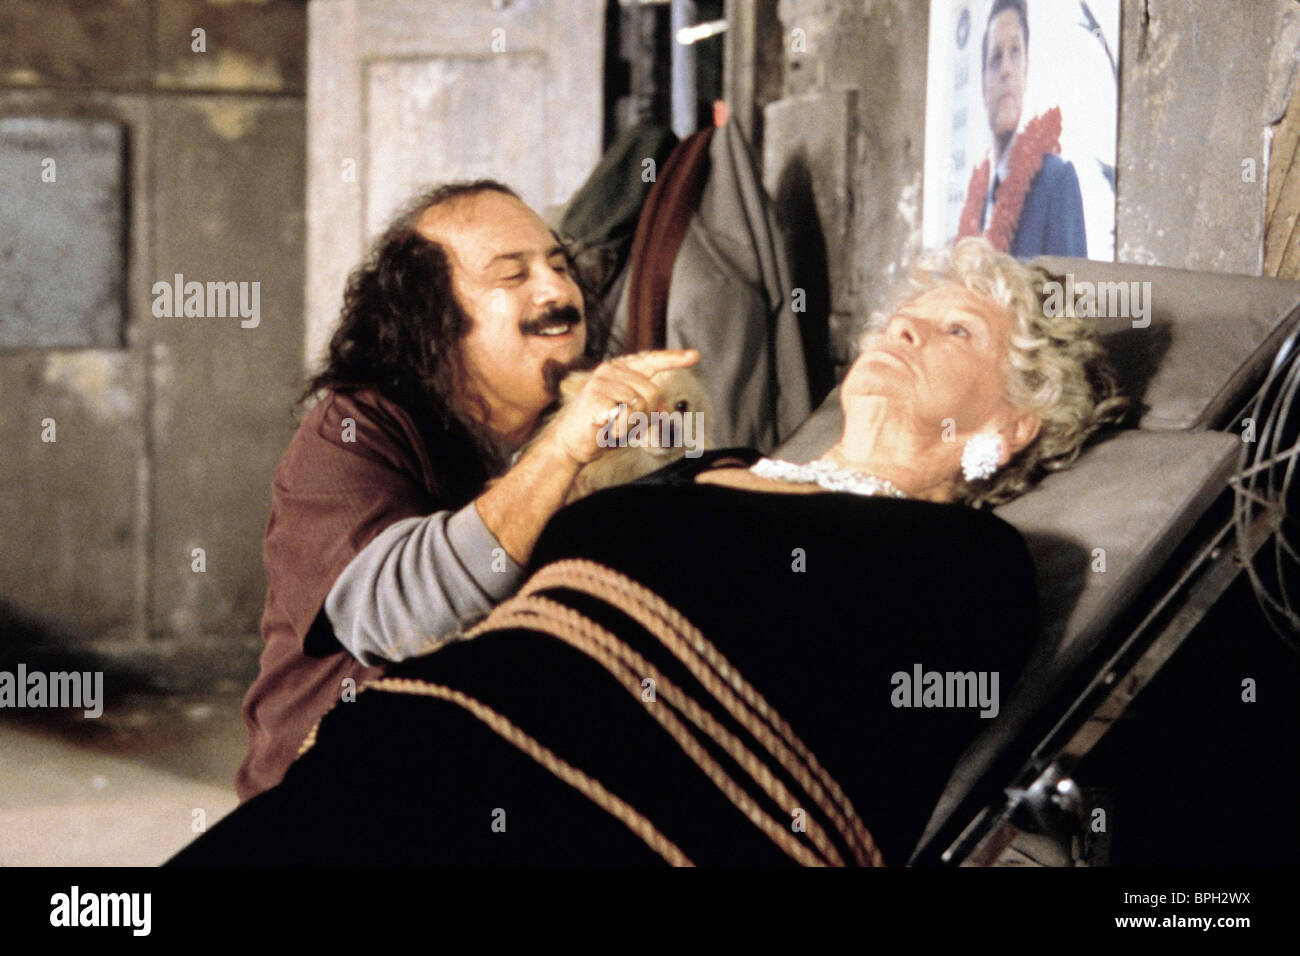 DANNY DEVITO & ELAINE STRITCH SCREWED (2000) - Stock Image